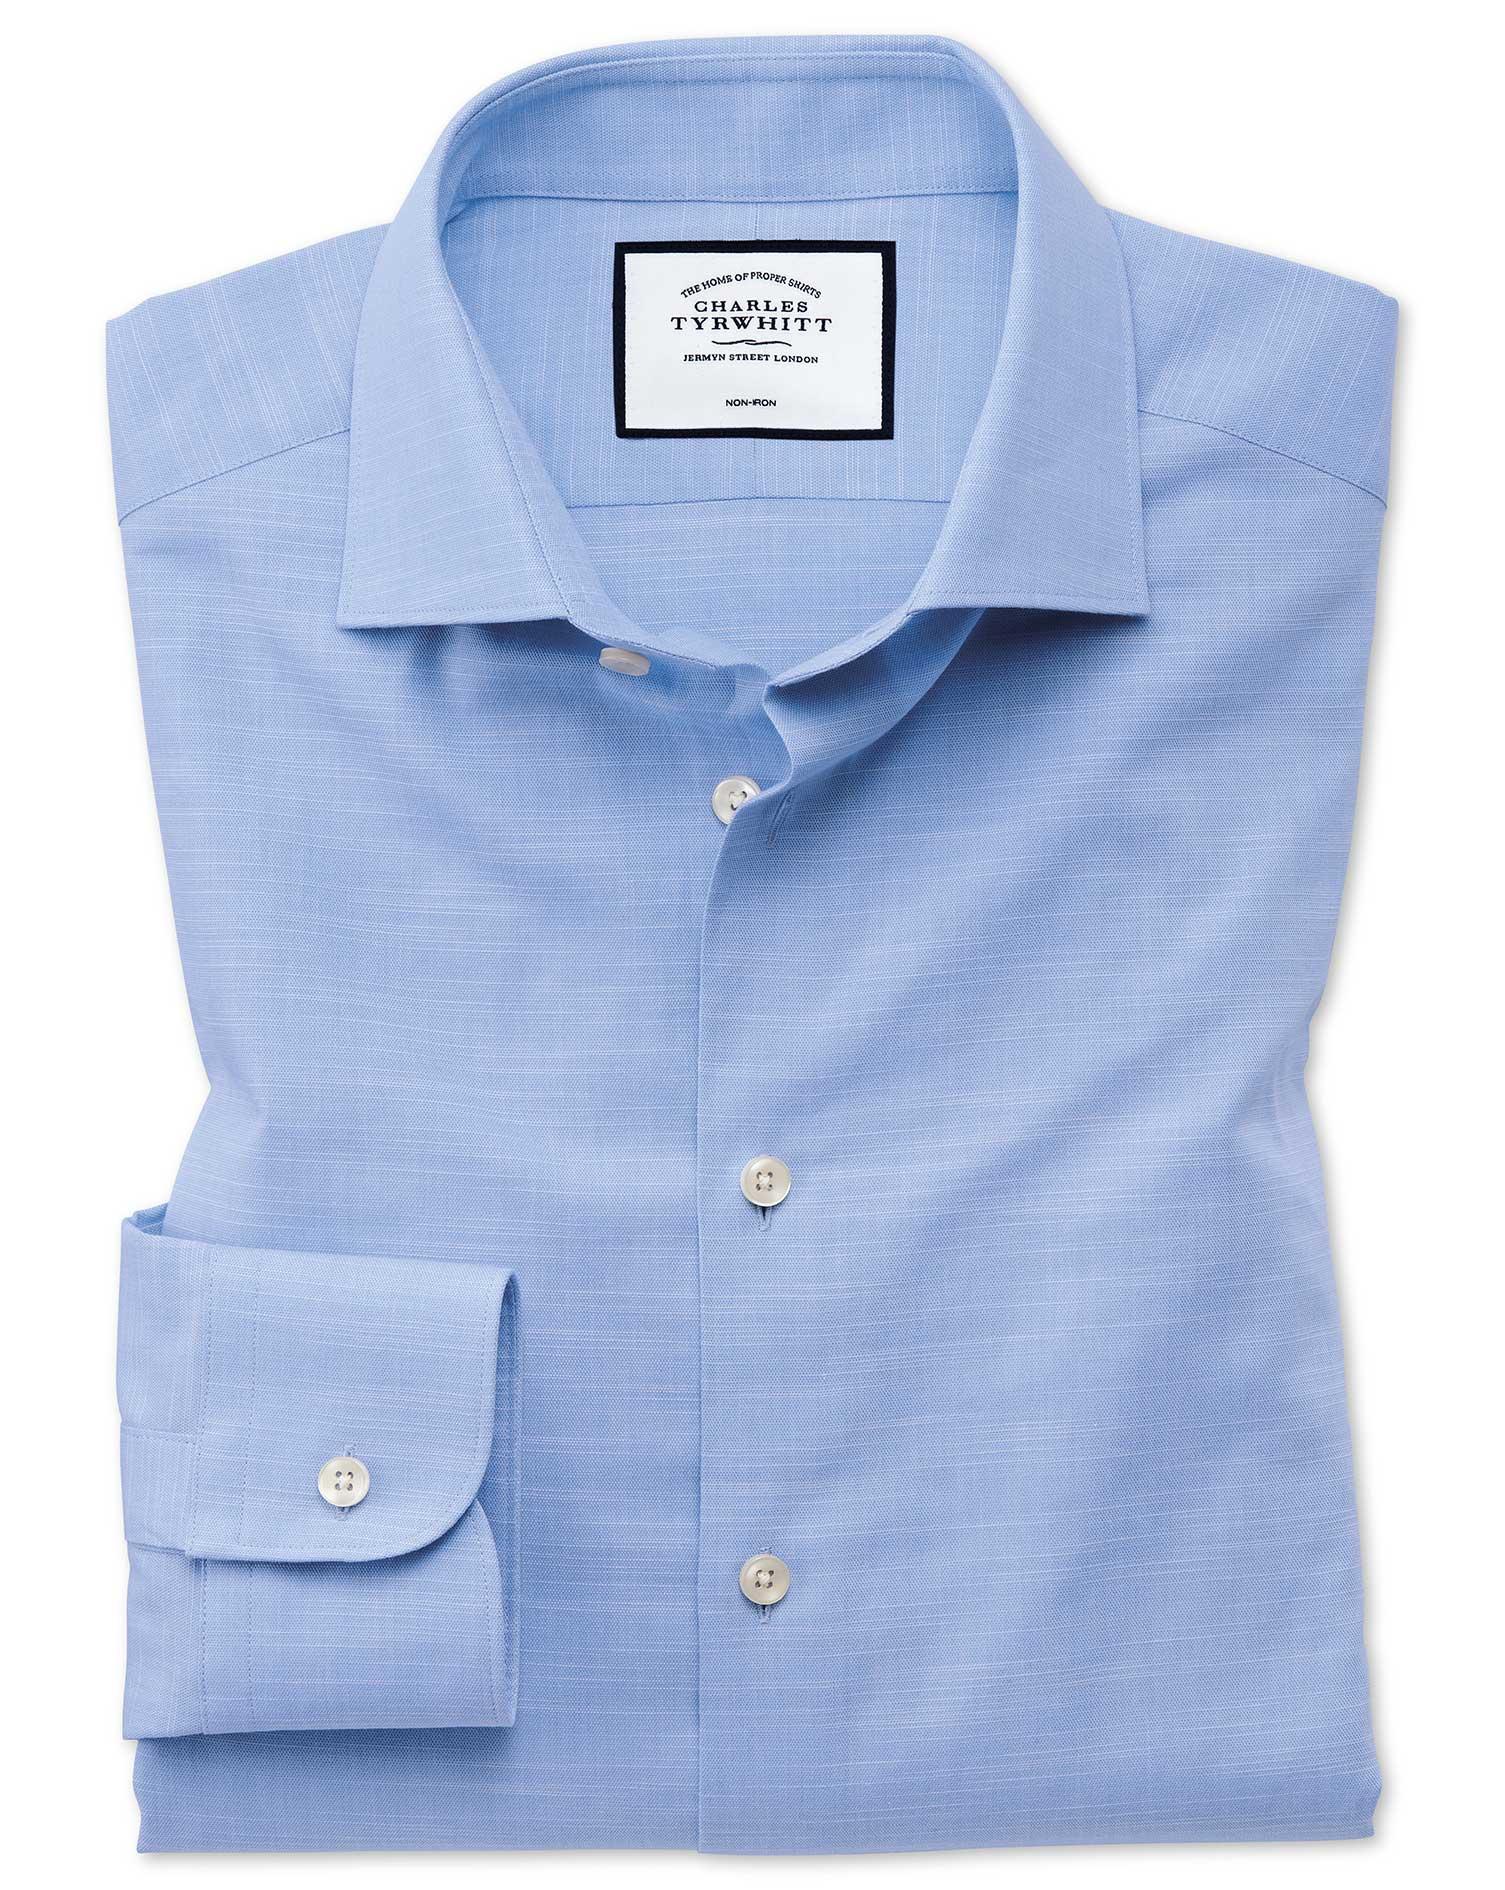 Slim Fit Business Casual Egyptian Cotton Slub Sky Blue Formal Shirt Single Cuff Size 14.5/33 by Char